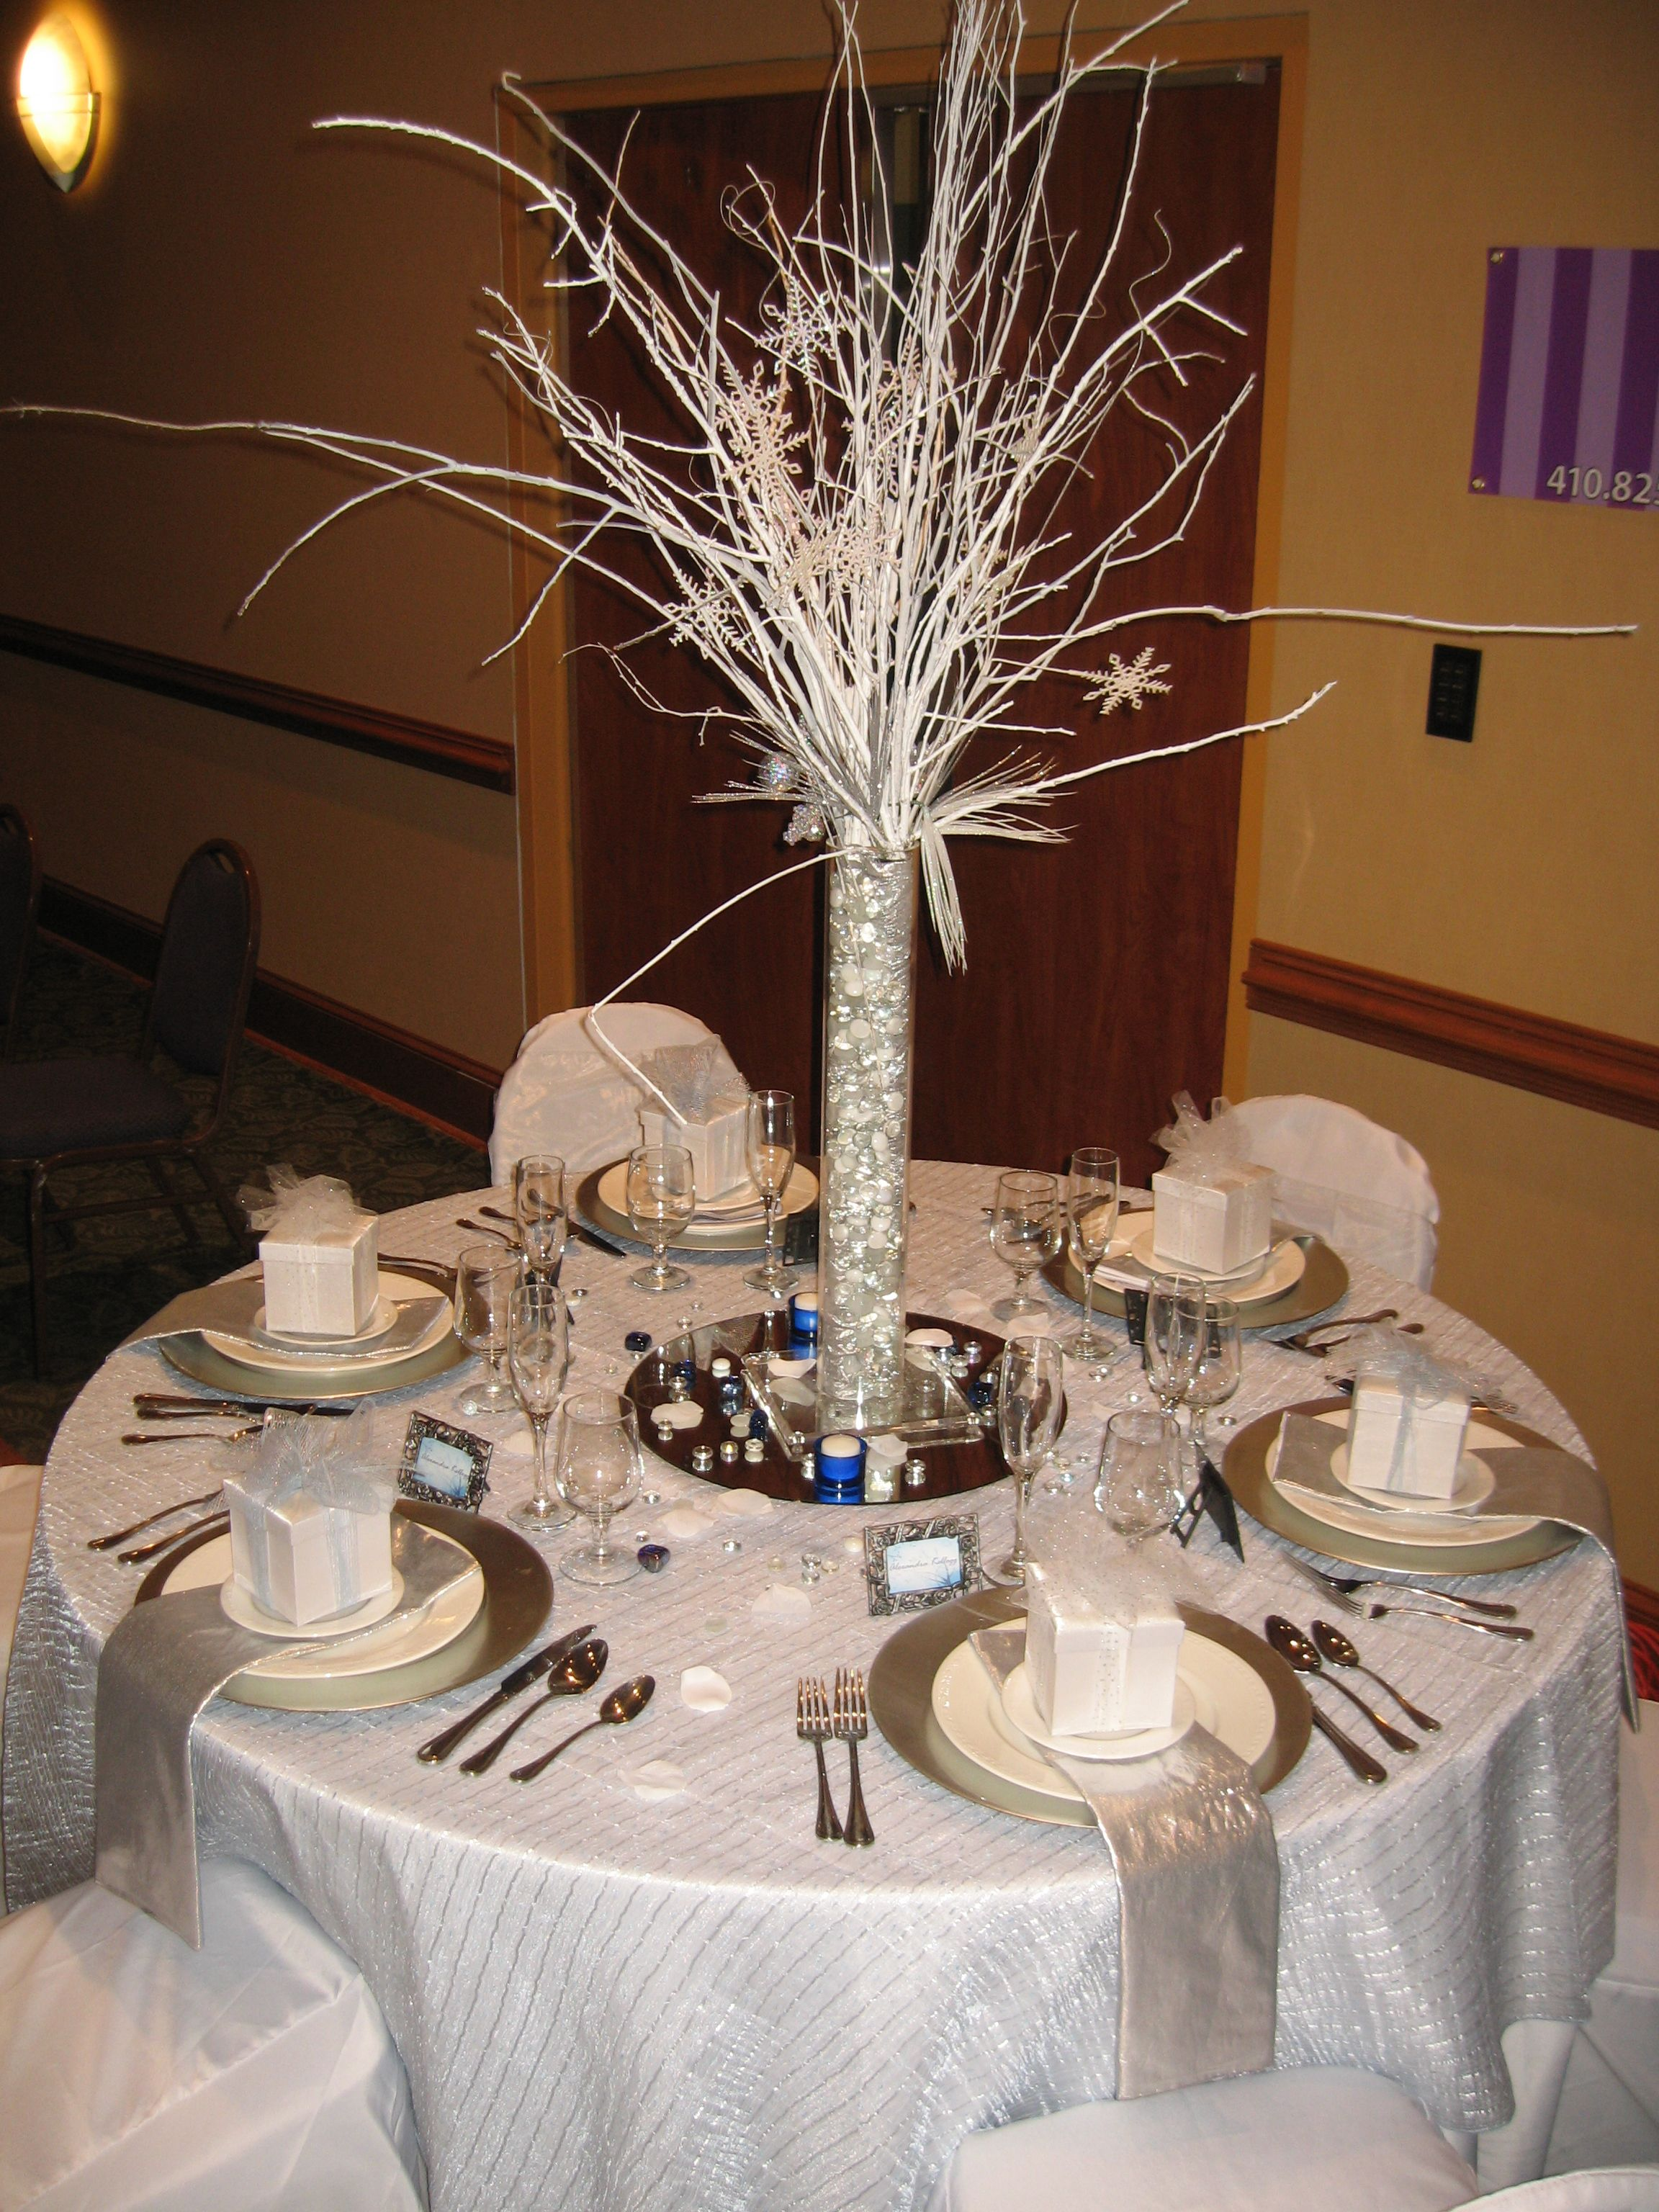 Winter Wonderland Table Decor | Centerpieces & Table Decor ...